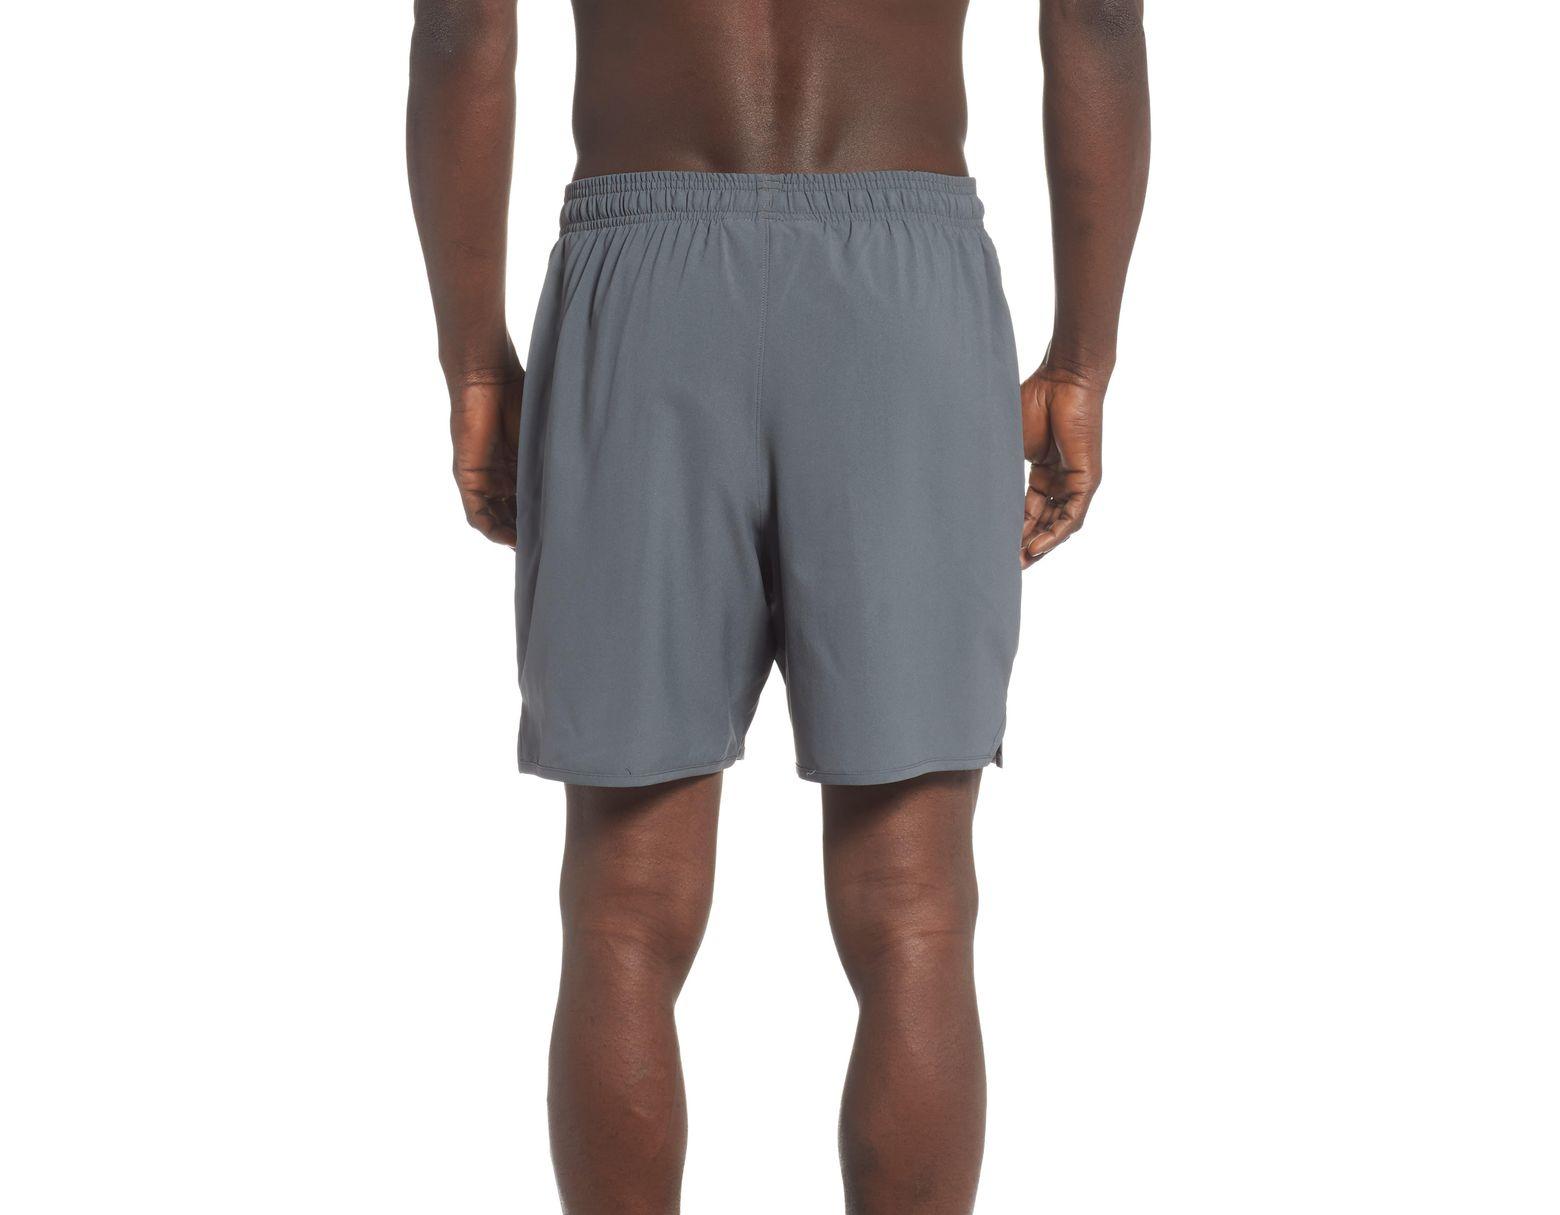 635533c25d Under Armour Dockside Volley Swim Trunks in Gray for Men - Lyst